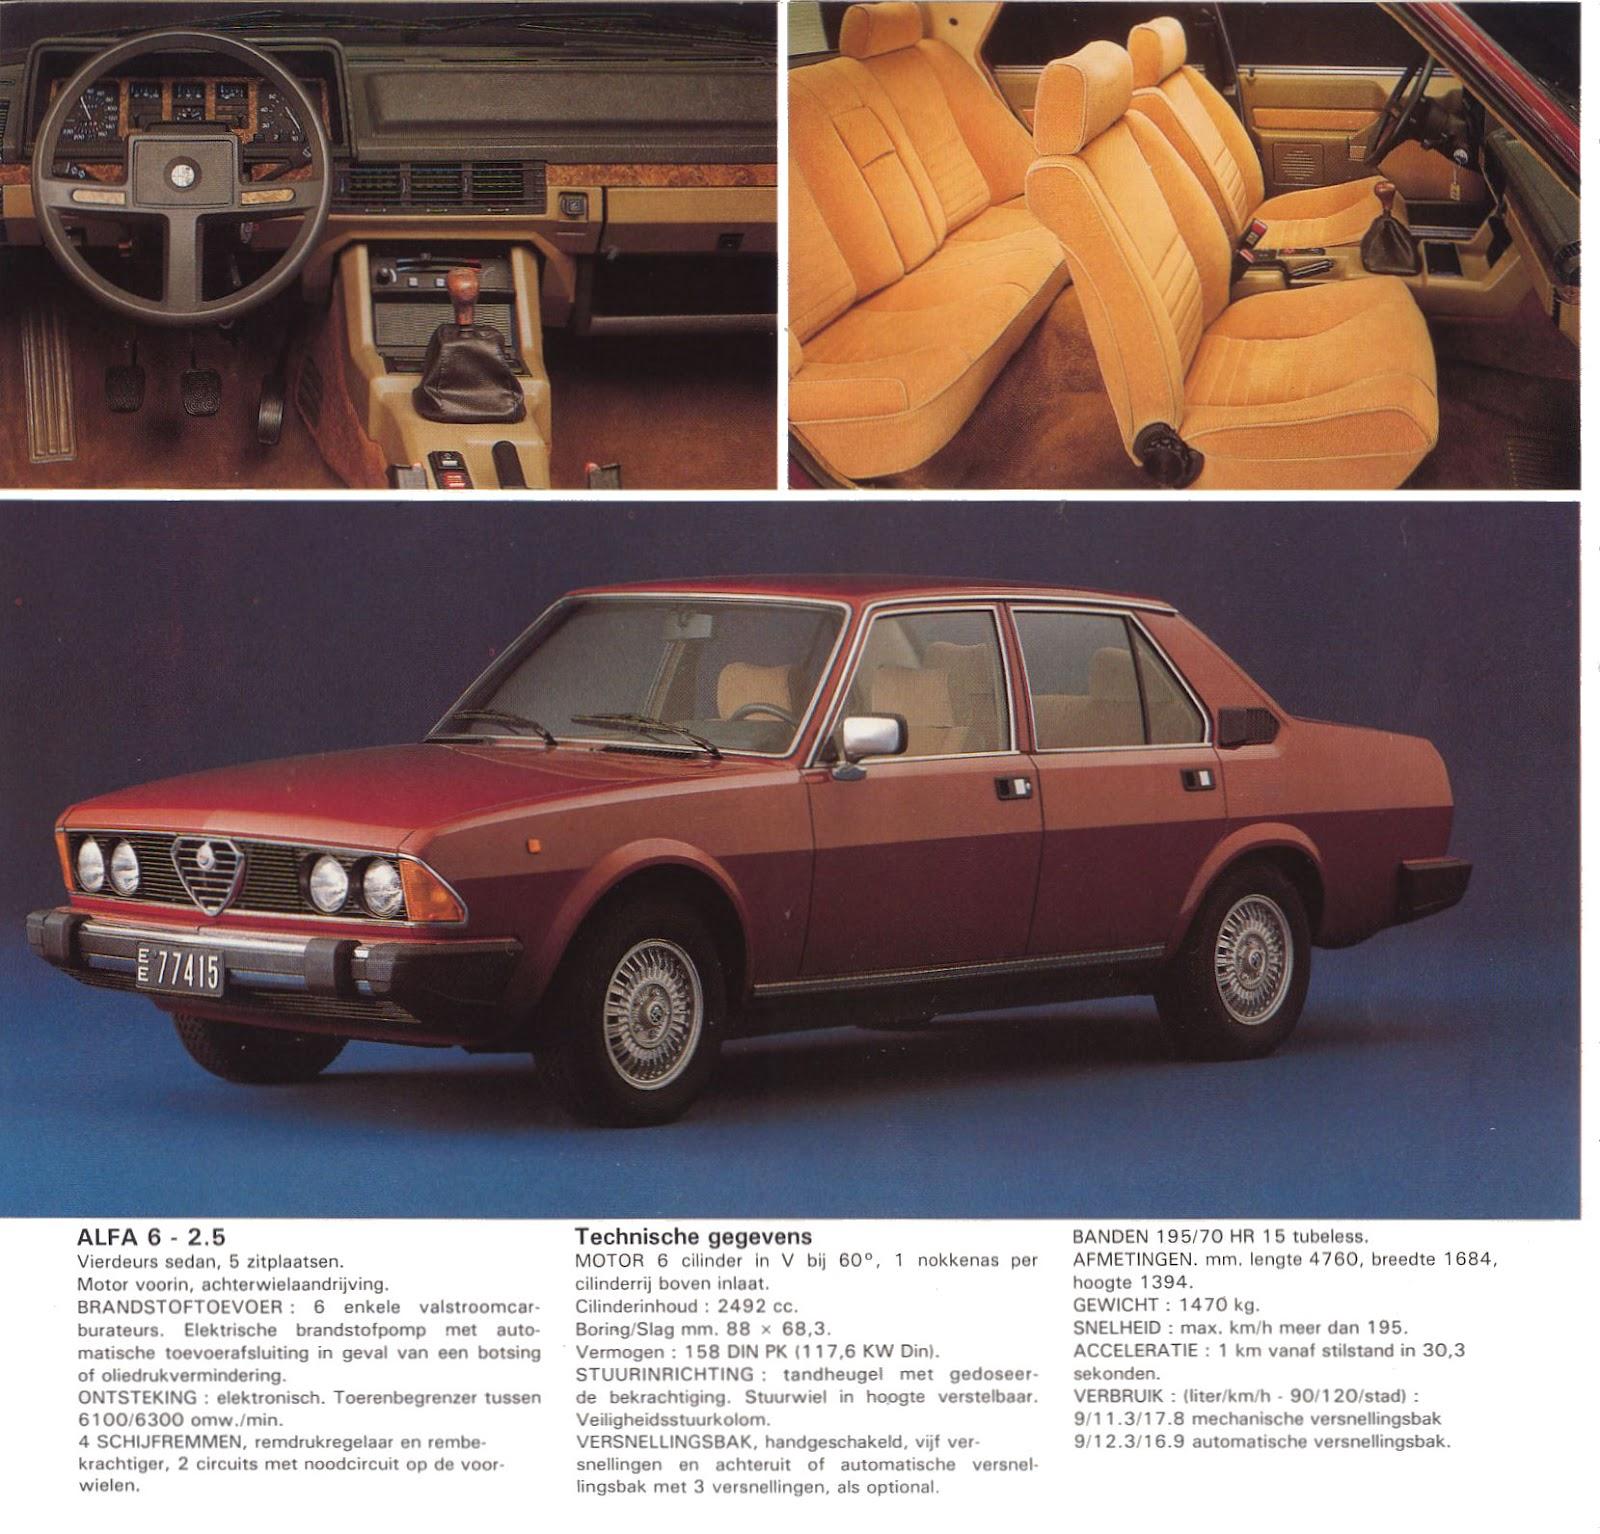 1981-Alfa-Romeo-6-2.51.jpg